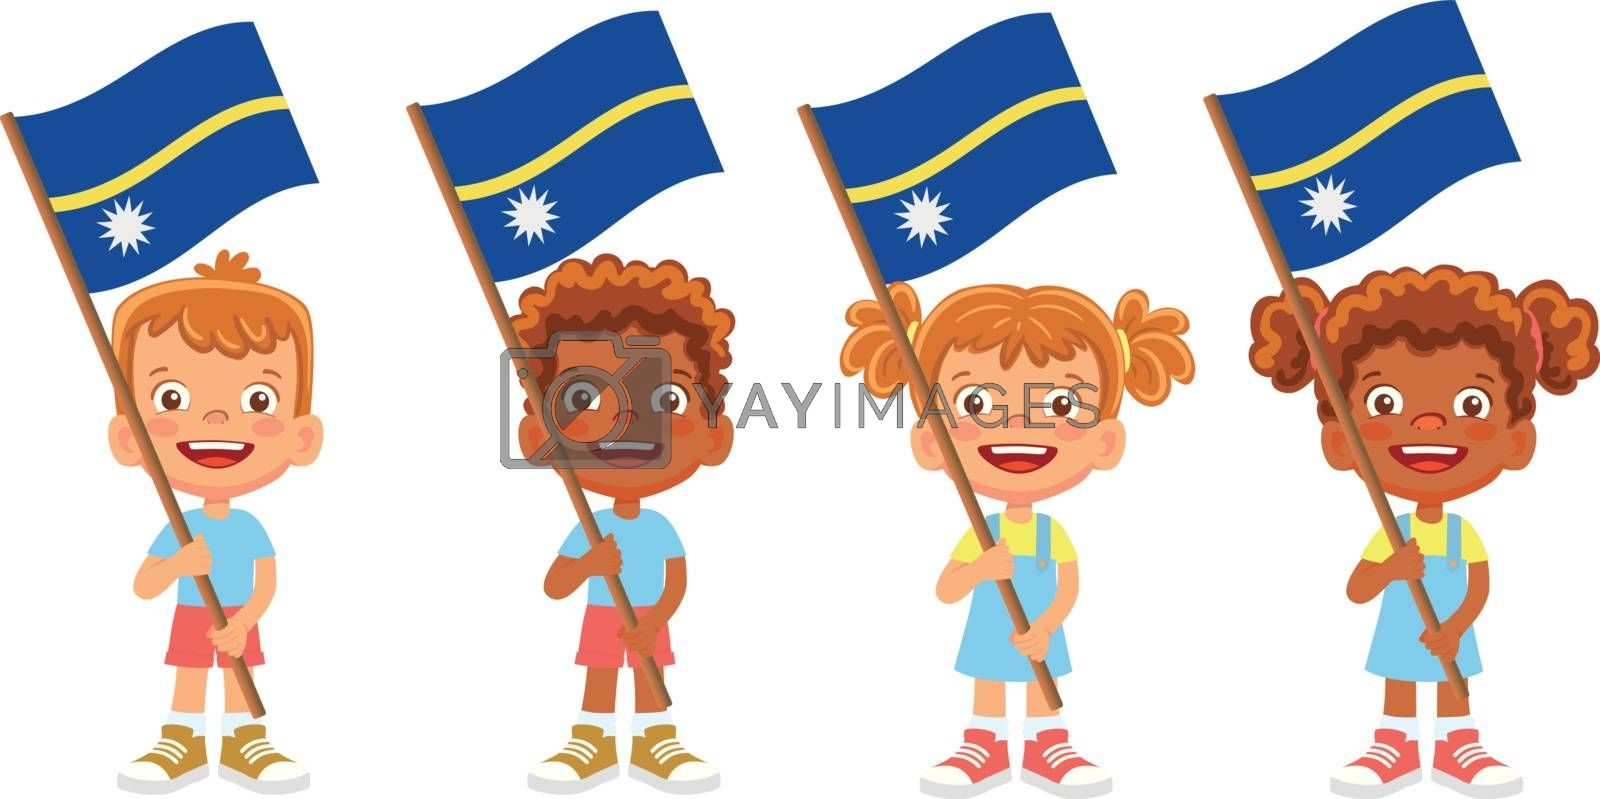 Nauru flag in hand. Children holding flag. National flag of Nauru vector